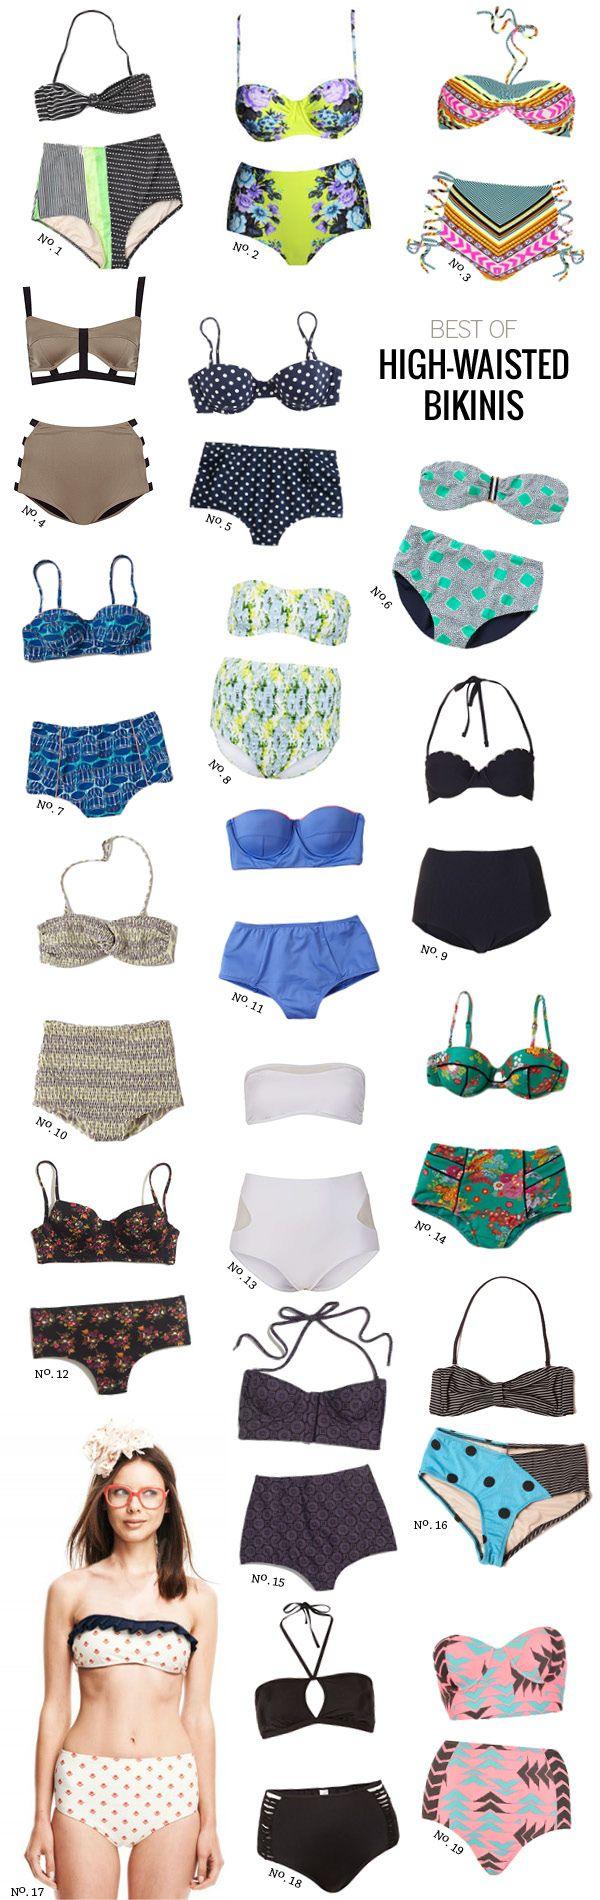 I am loving the high waisted bikinis this season....  Best Of: High-Waisted Bikinis by Modern Eve